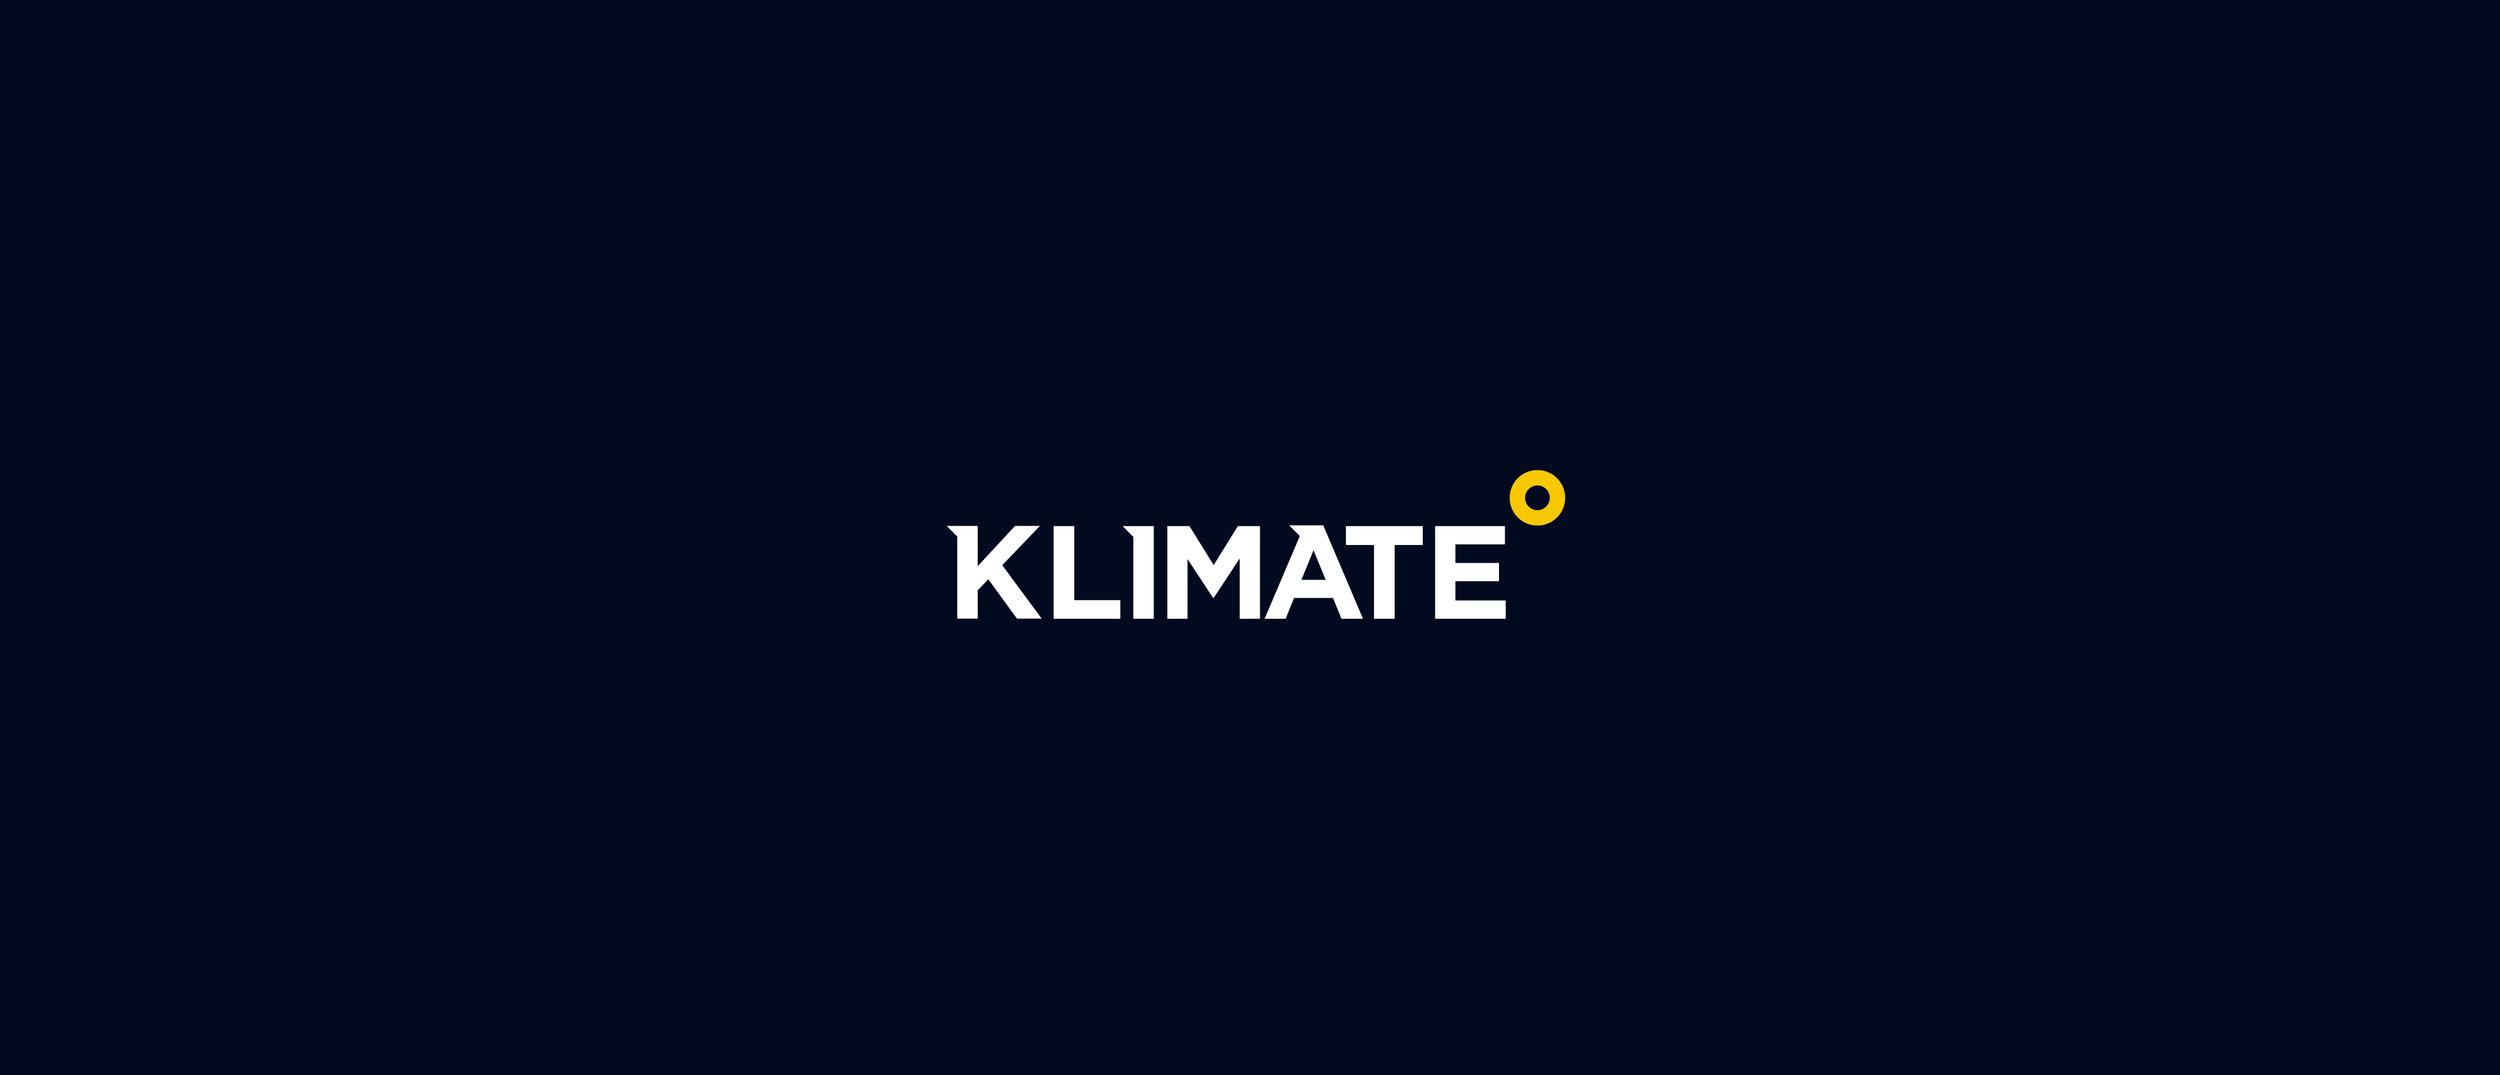 Klimate | Network Monitoring Software | 2017